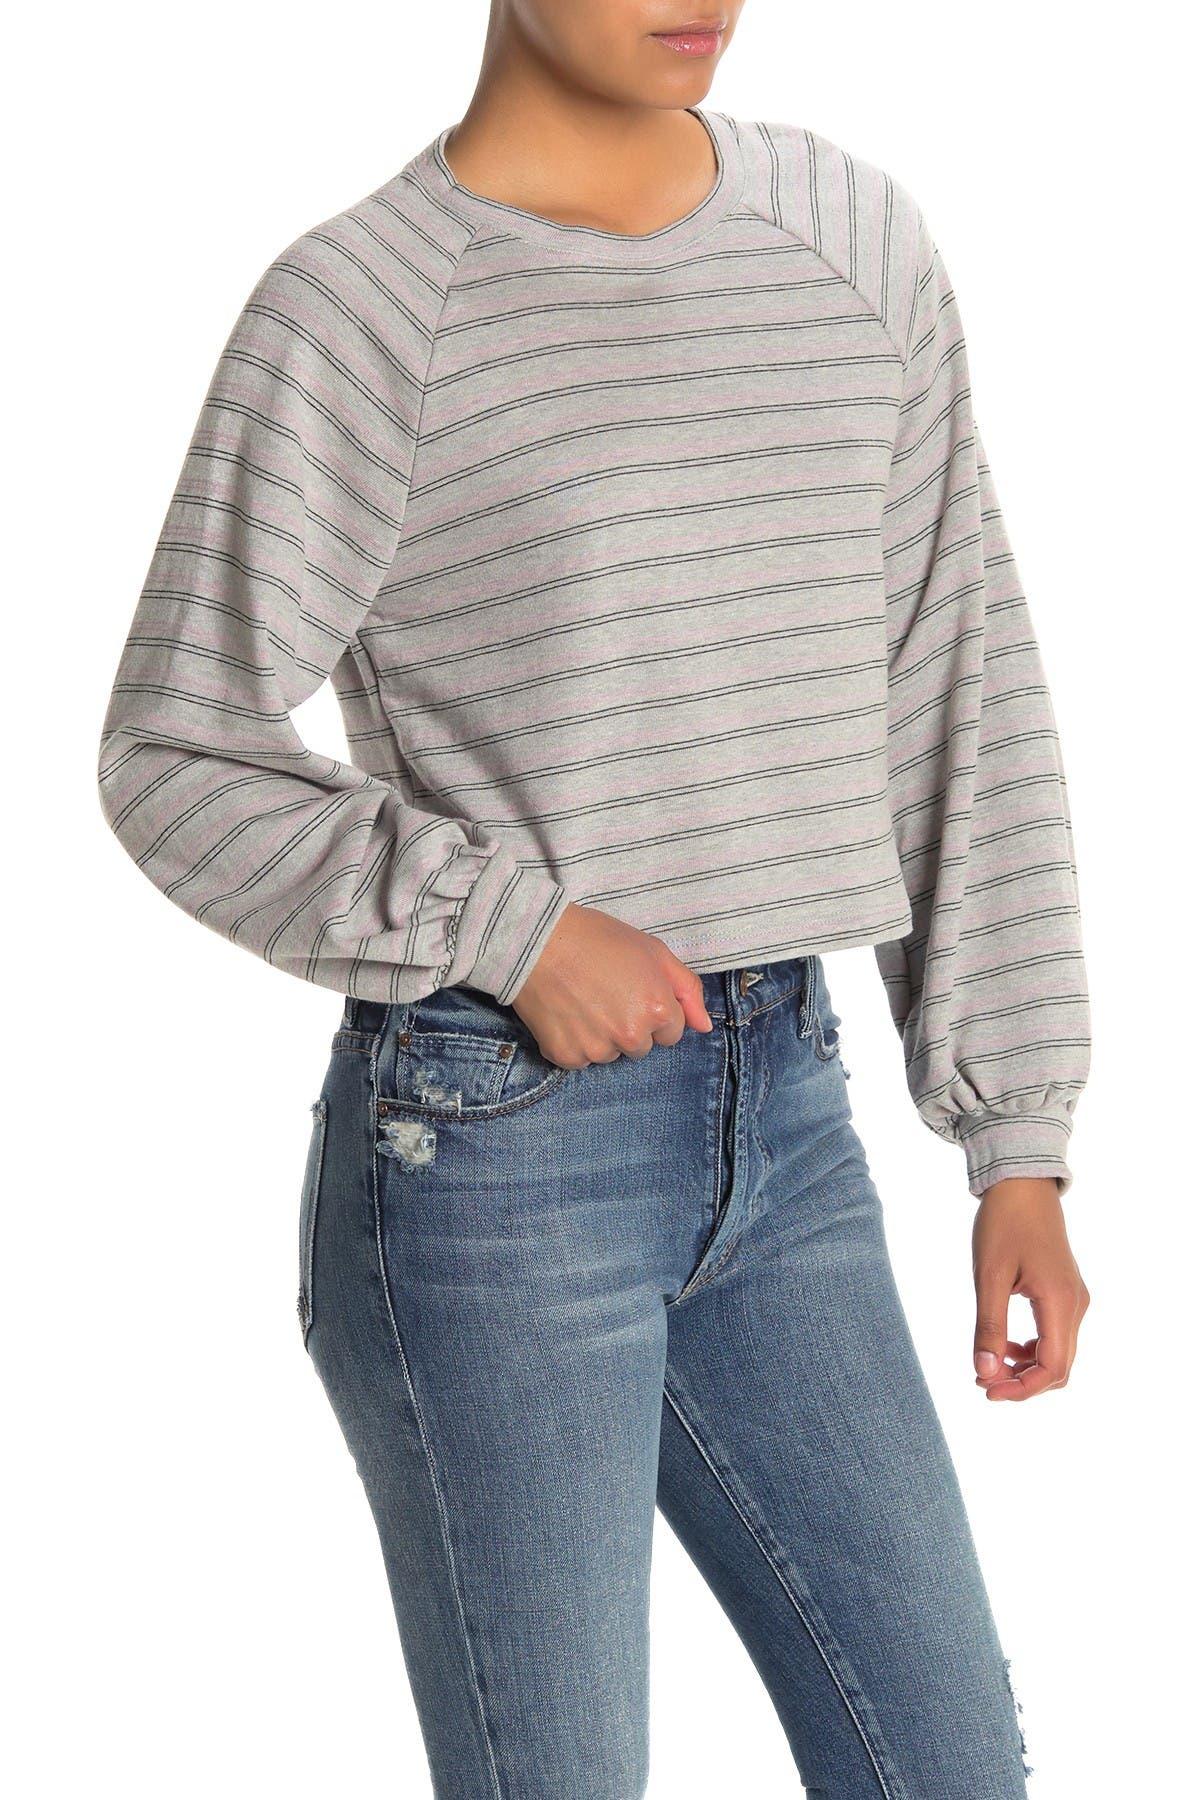 Image of Lush Striped Balloon Sleeve Crop Sweatshirt